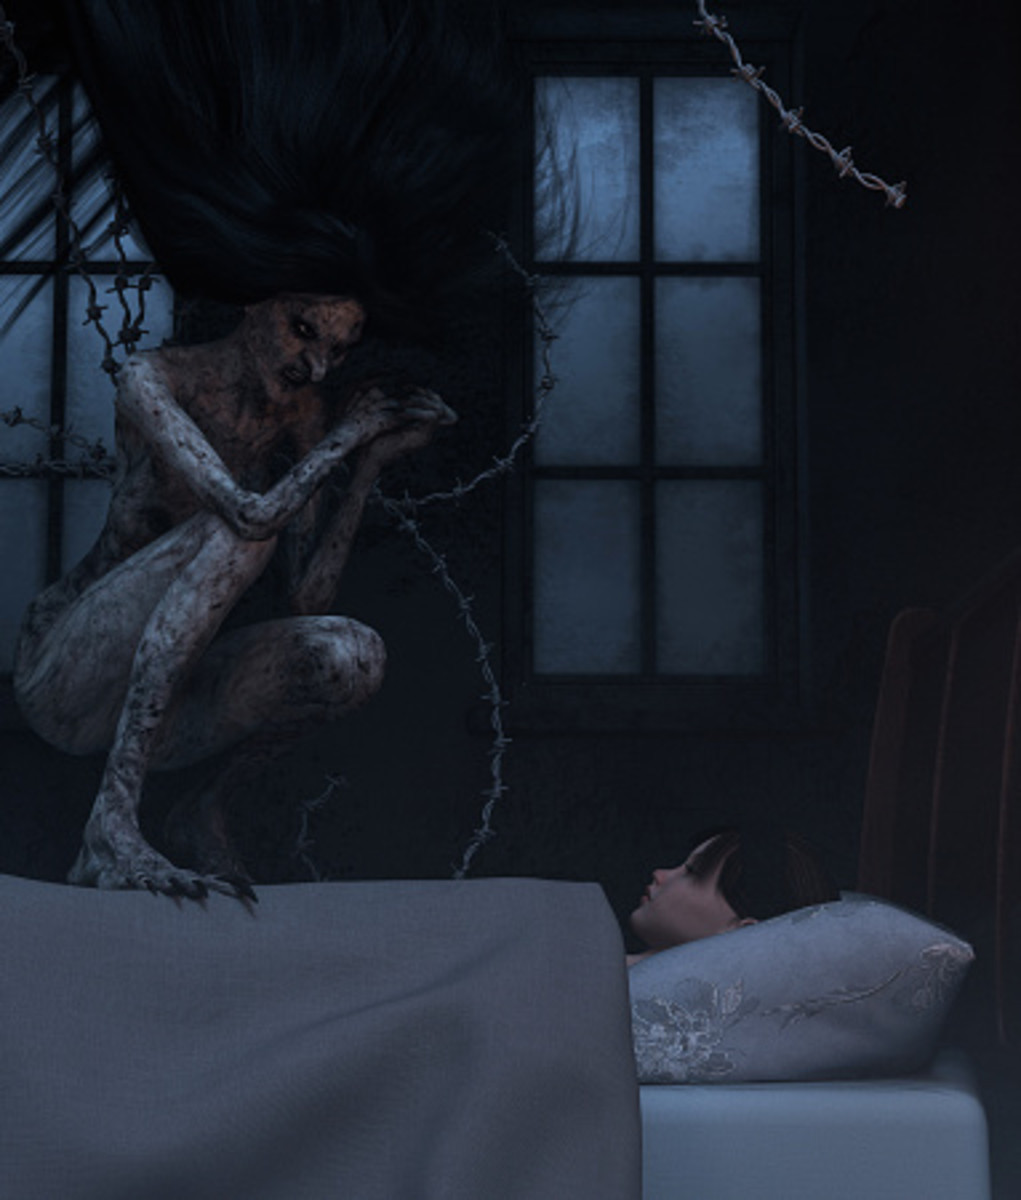 Something in the Darkness: Sleep Paralysis Demon or Waking Nightmare?